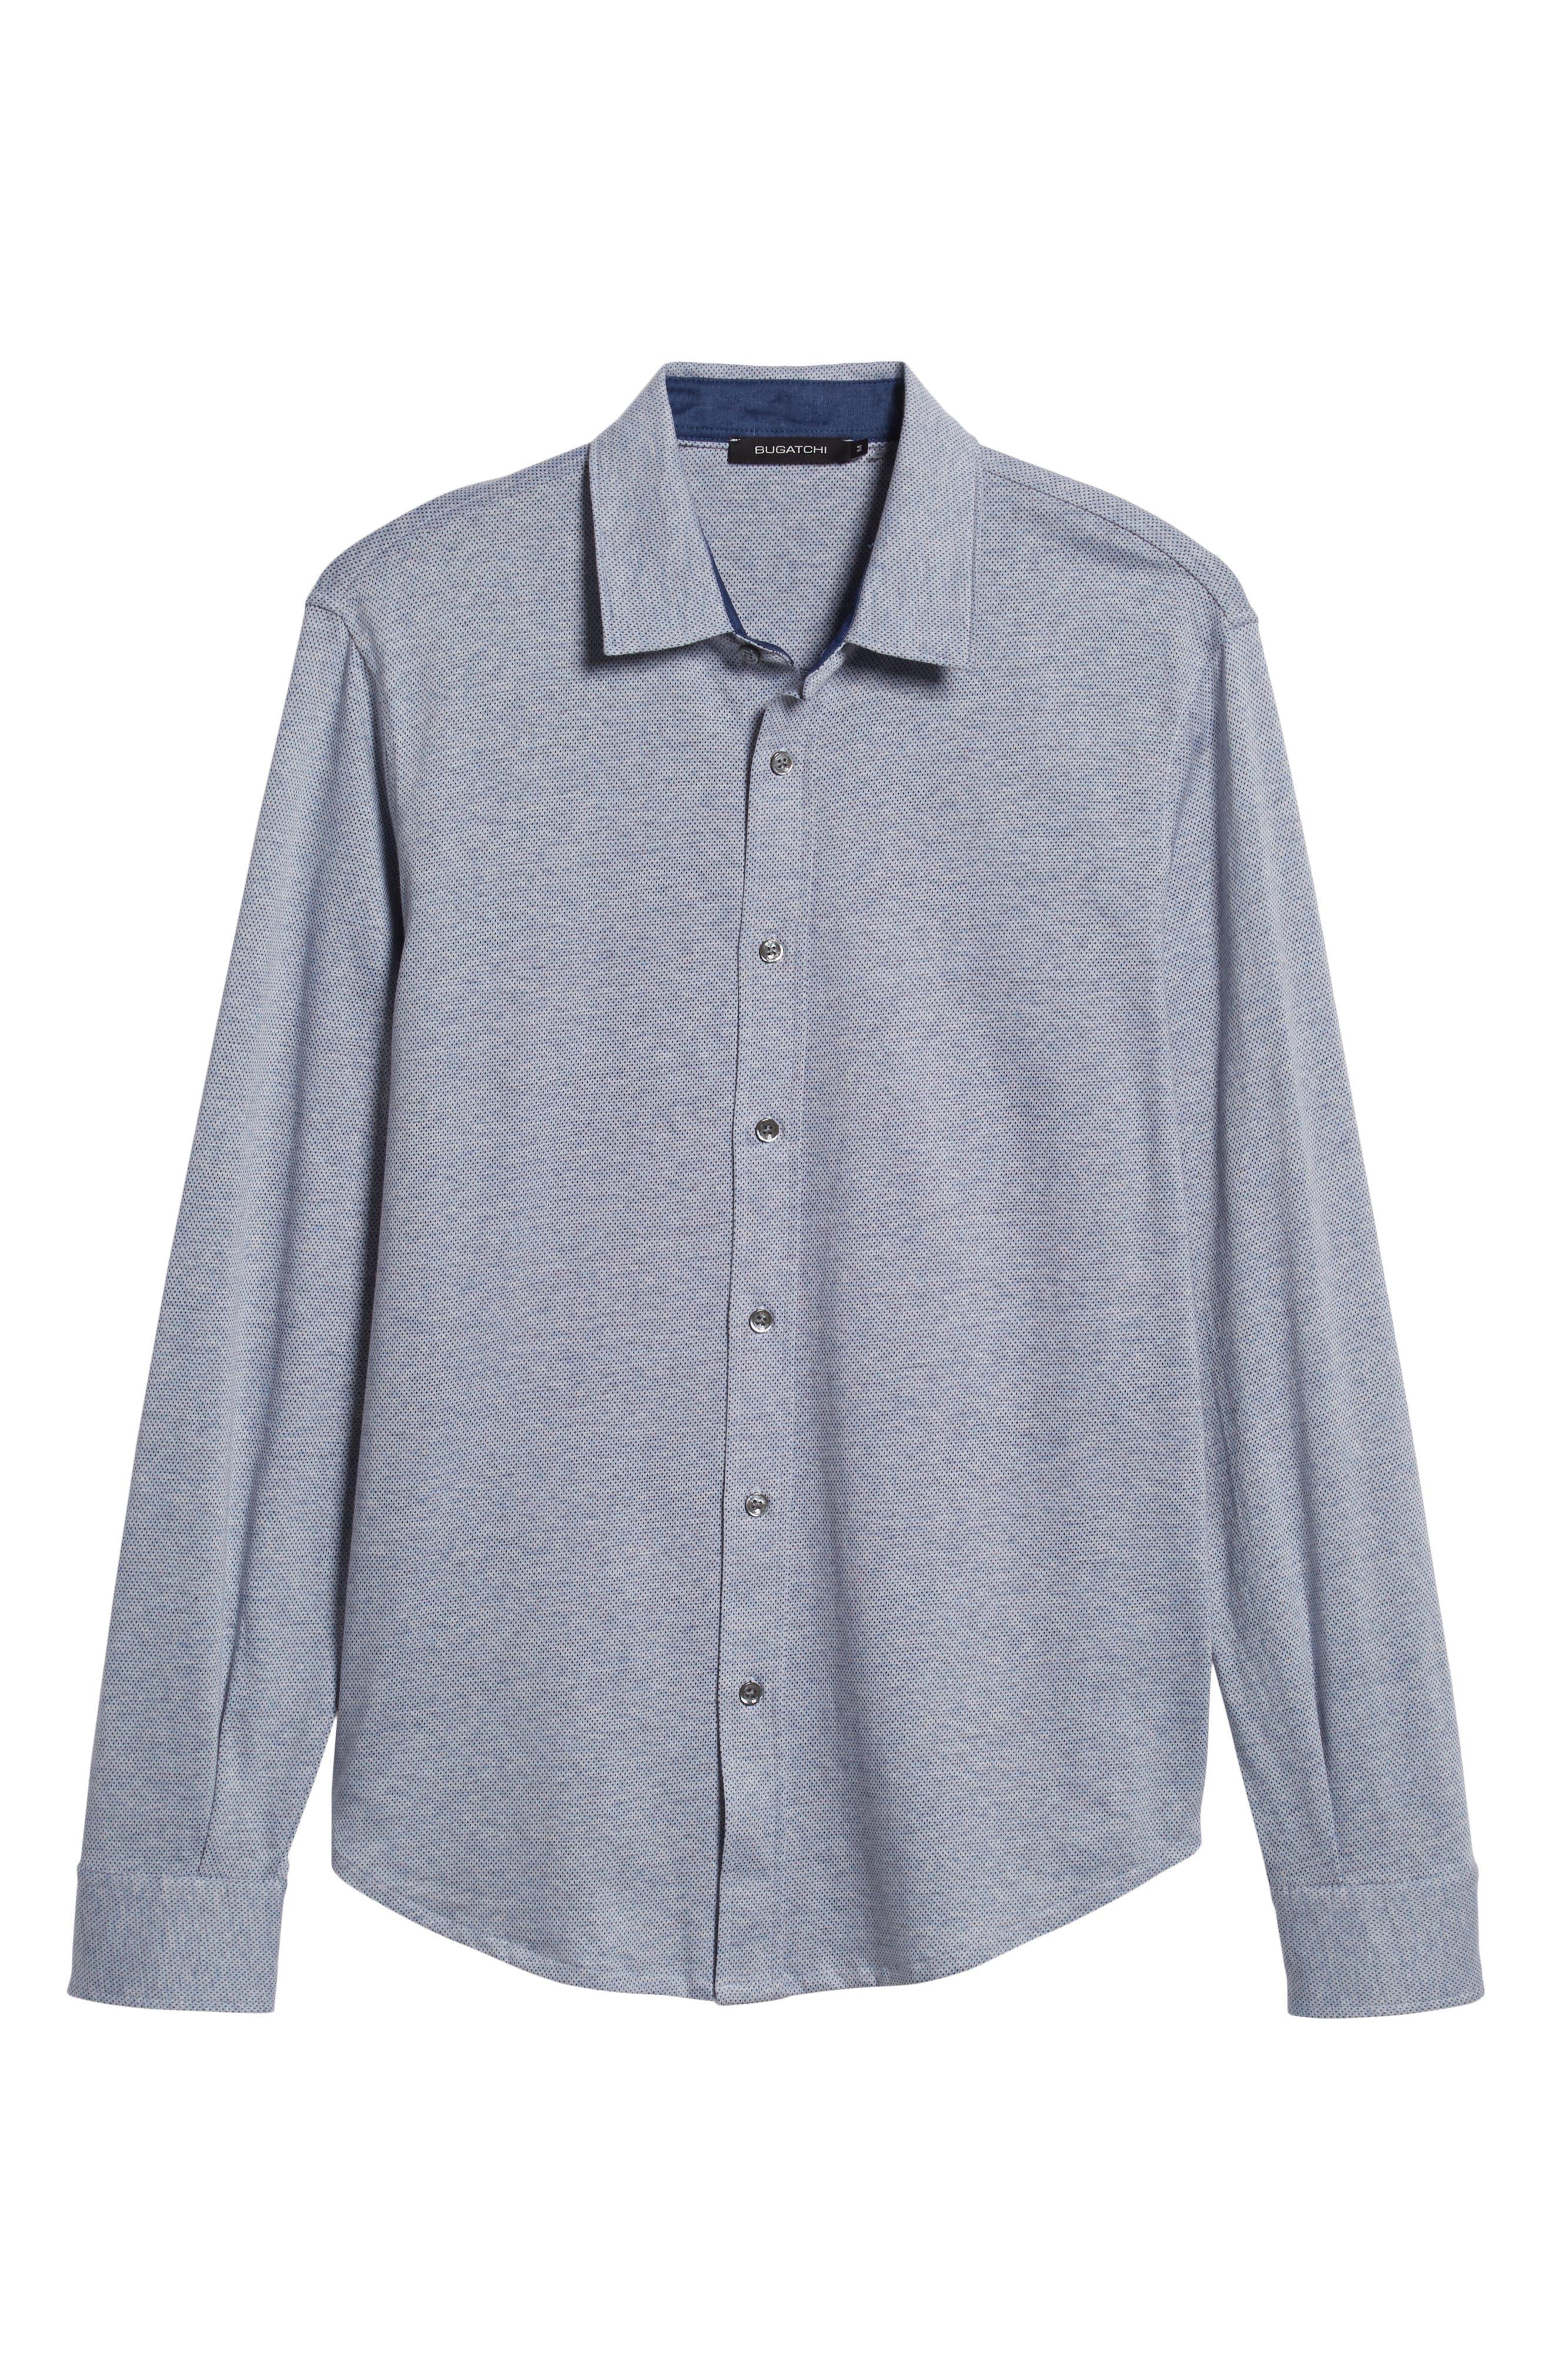 Regular Fit Microdot Knit Sport Shirt,                             Alternate thumbnail 5, color,                             AIR BLUE